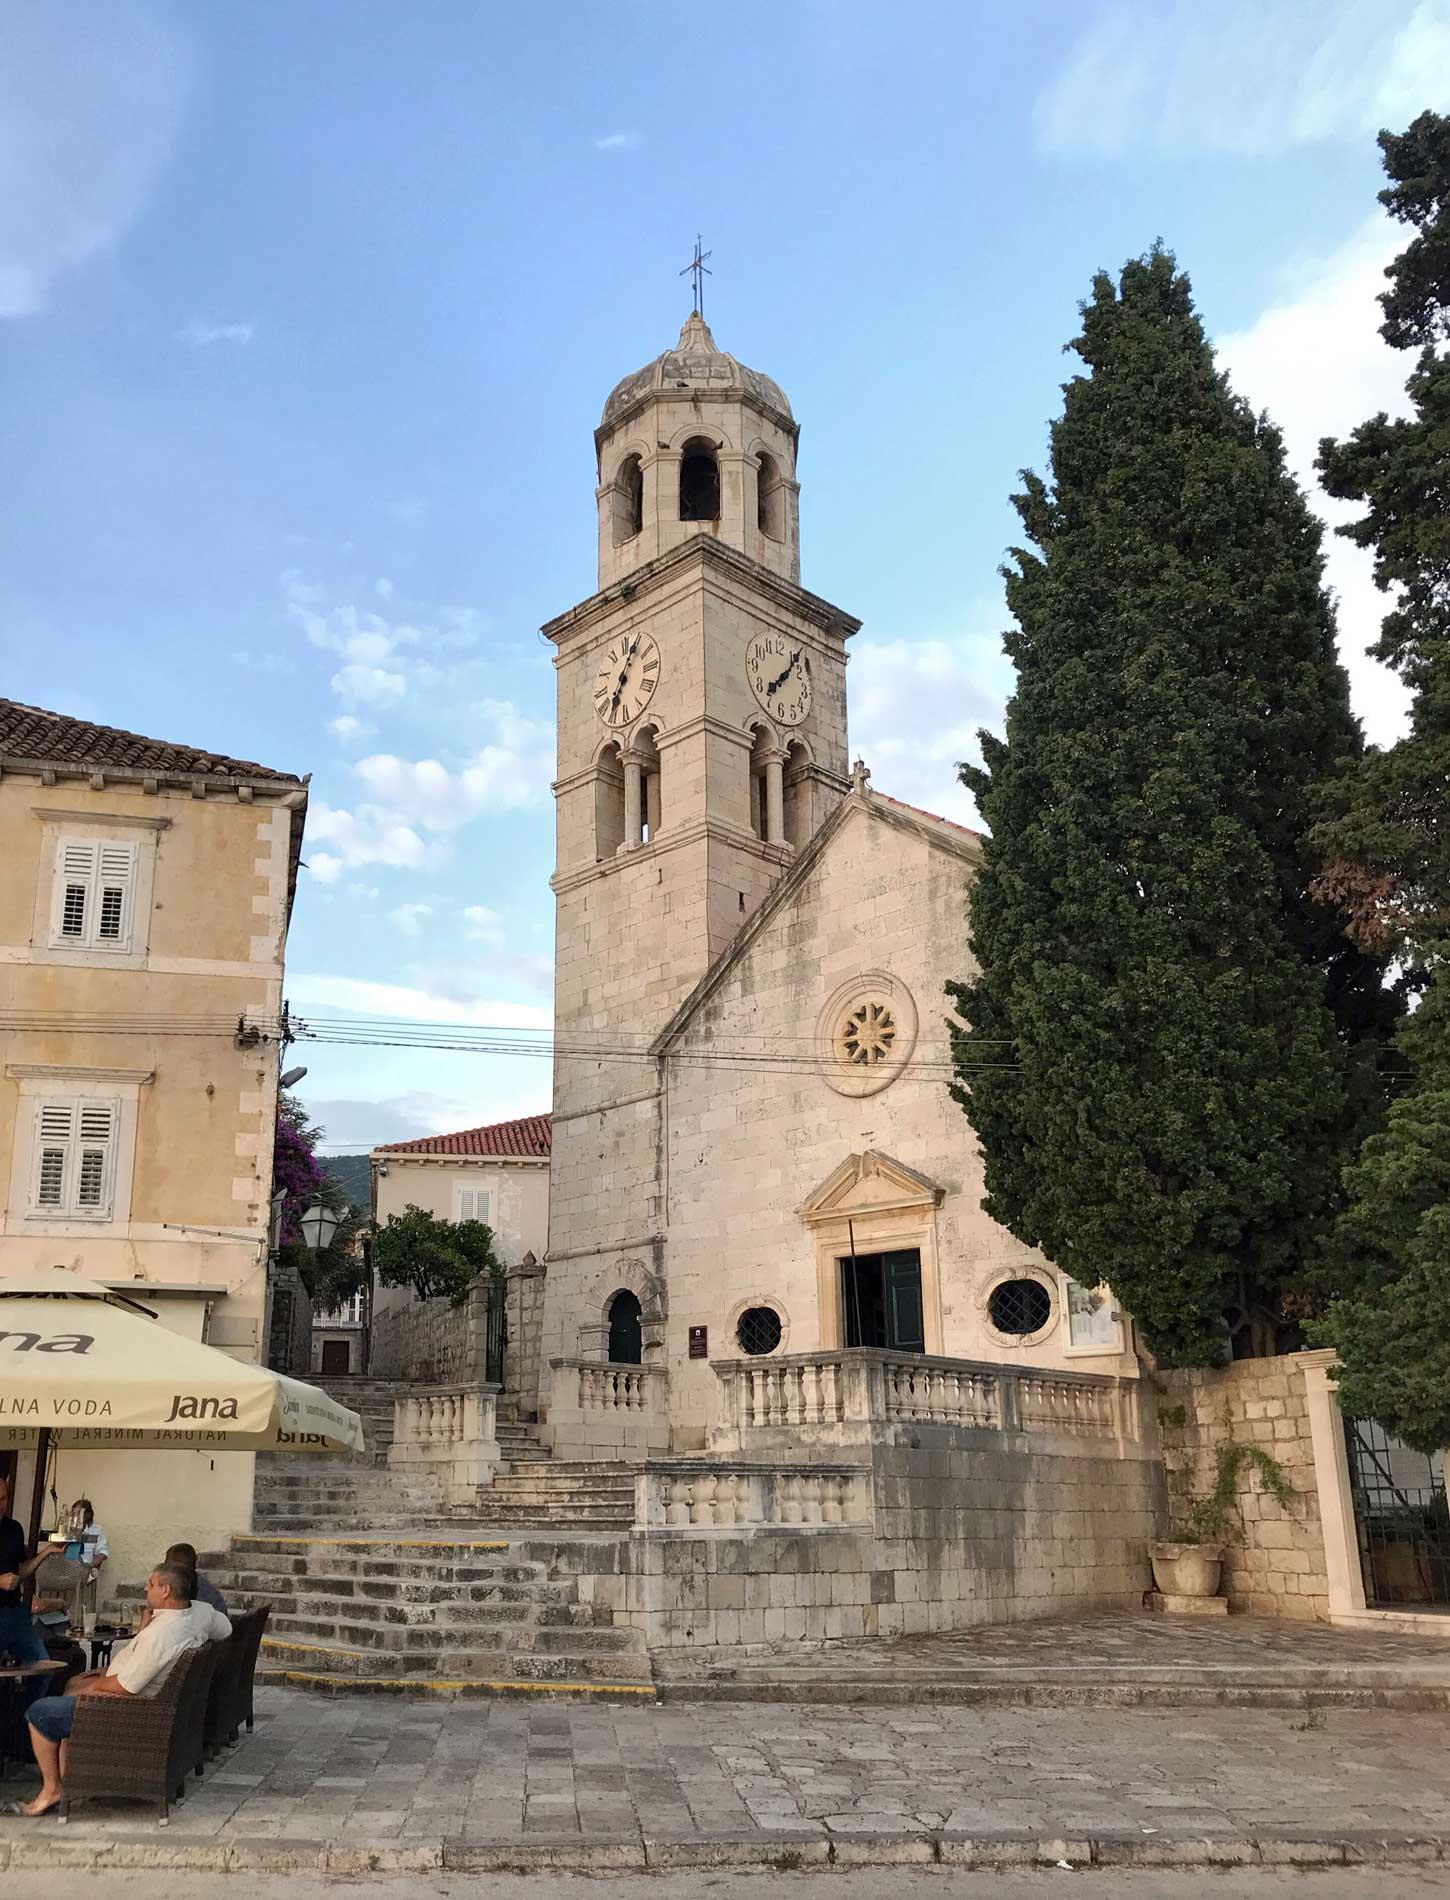 Cavtat-Dubrovnik-Croazia-chiesa-di-San-Nicola